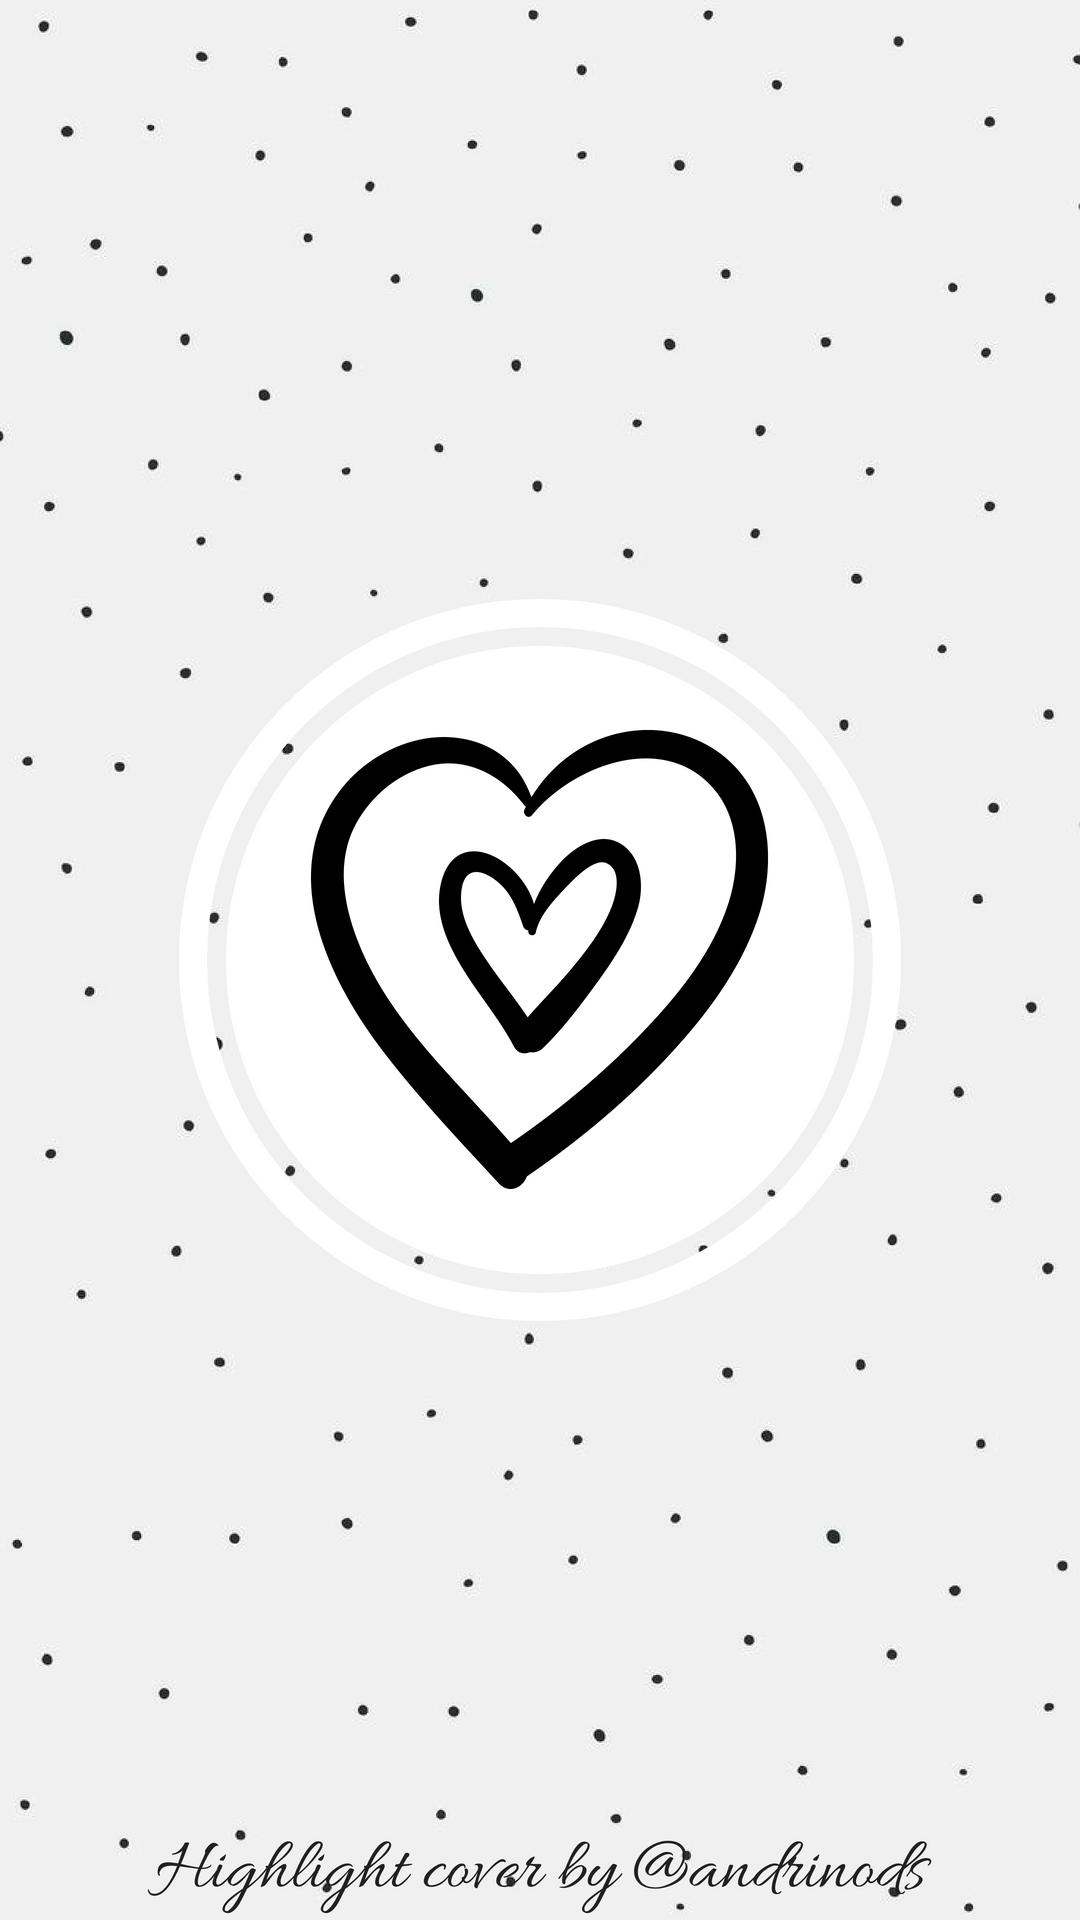 Pin de Kayla Braden em Instagram Highlight icons